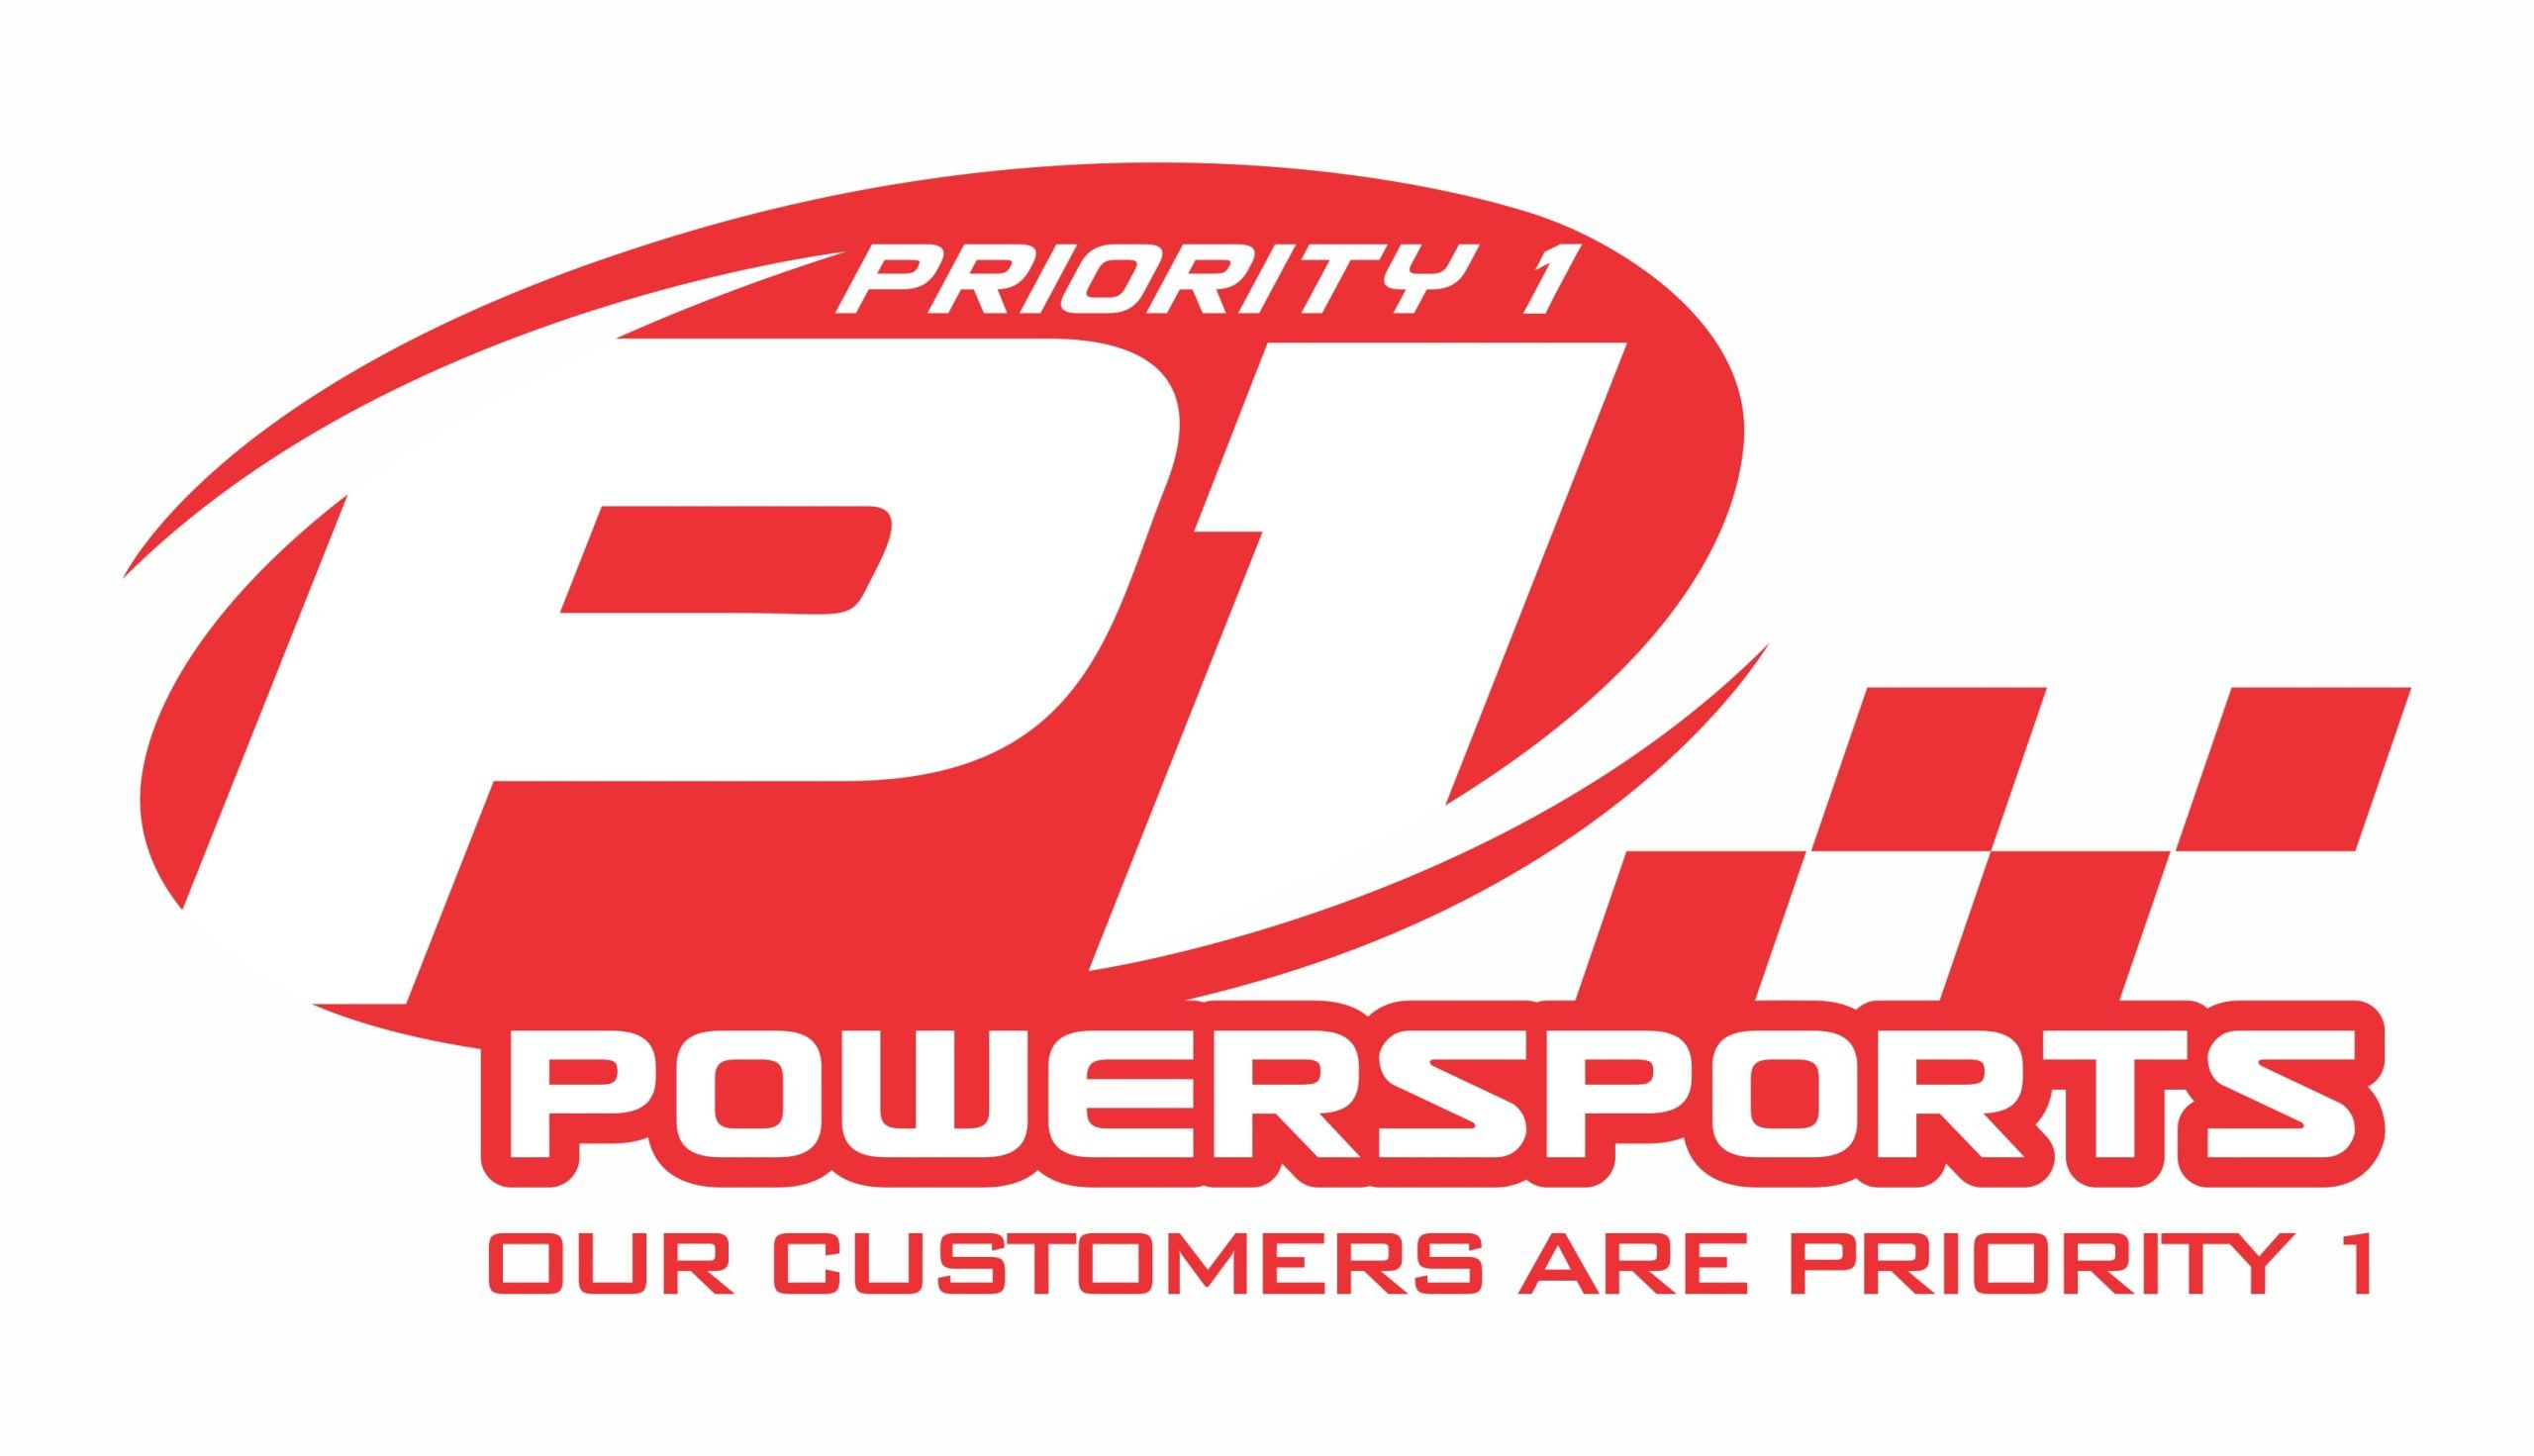 Priority 1 Powersports